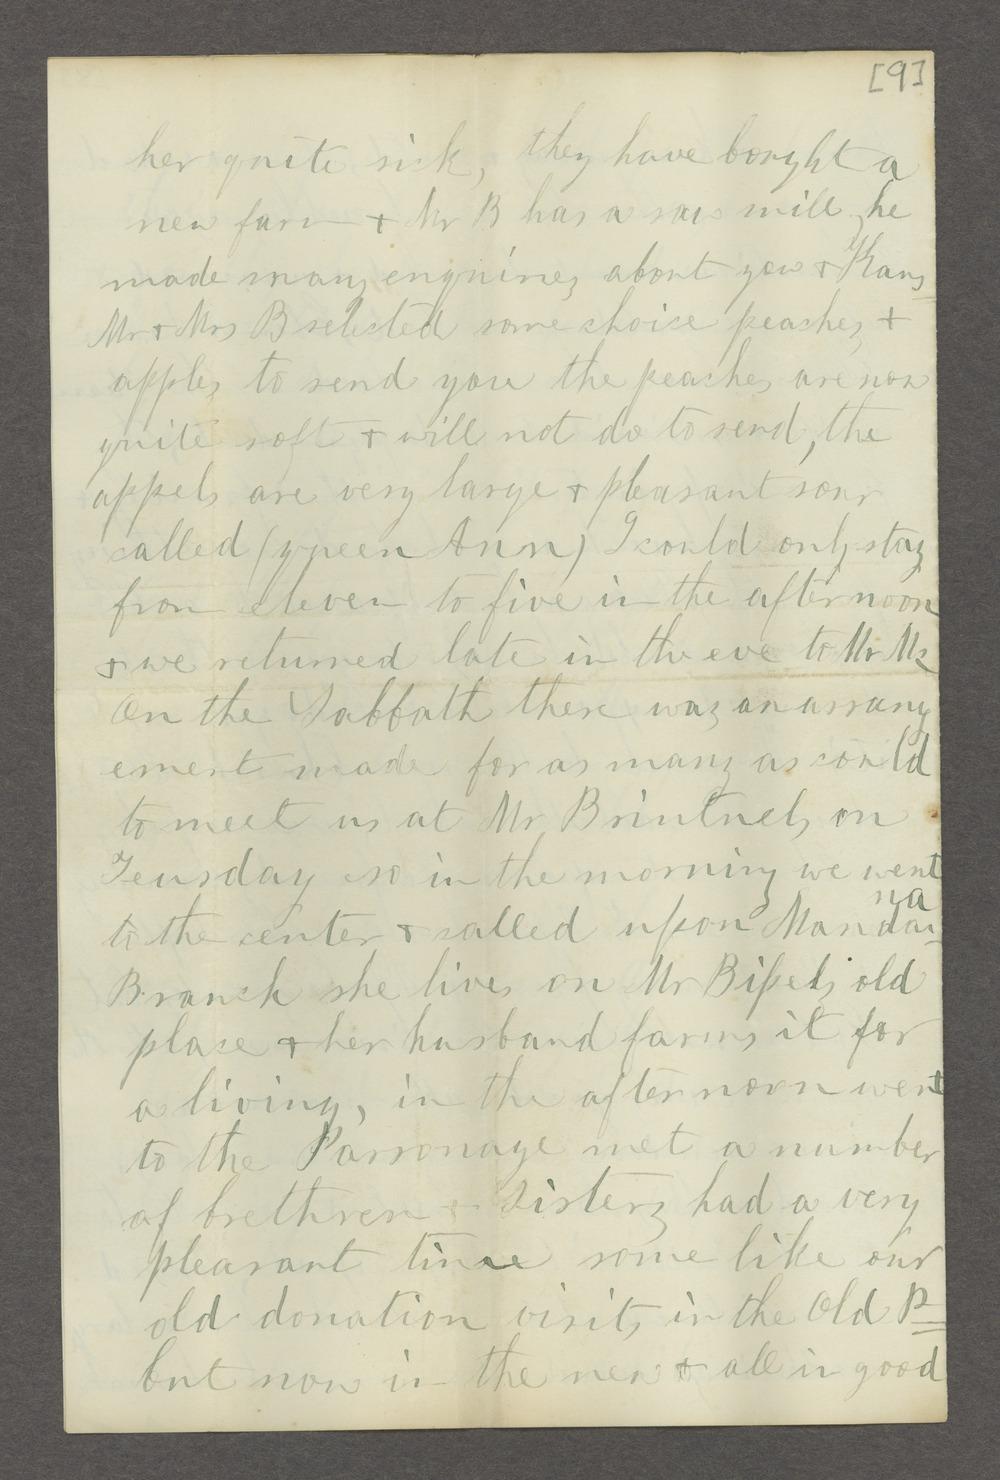 Correspondence between Samuel Lyle Adair, Florella Brown Adair, and their children - 12